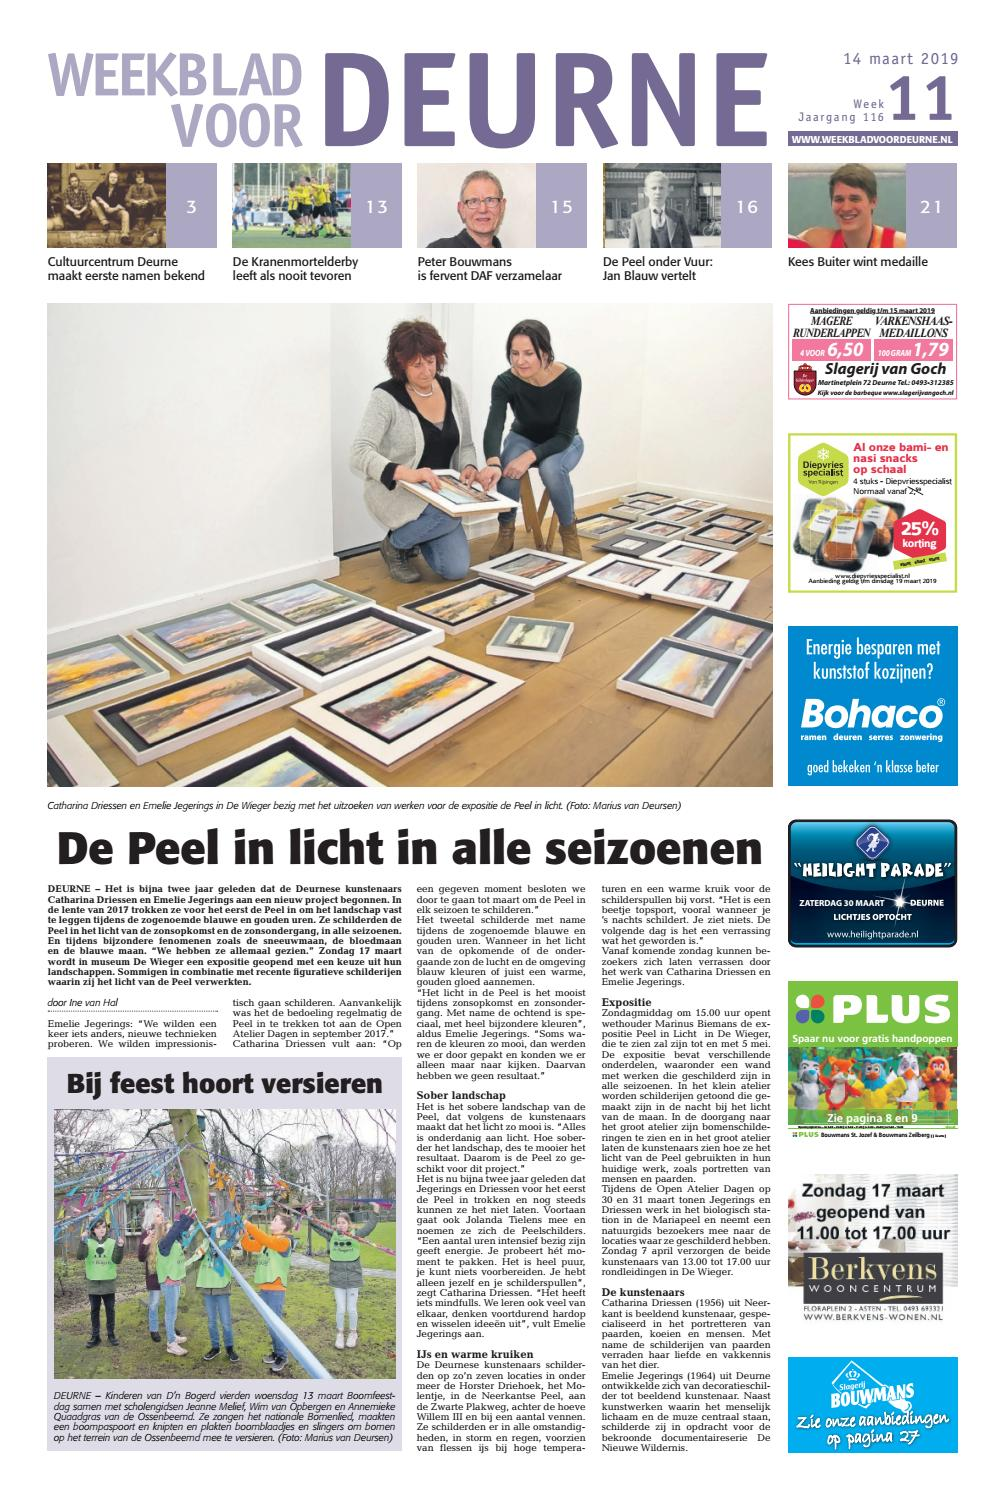 987bf1de0a8 Weekblad voor Deurne 14-03-2019